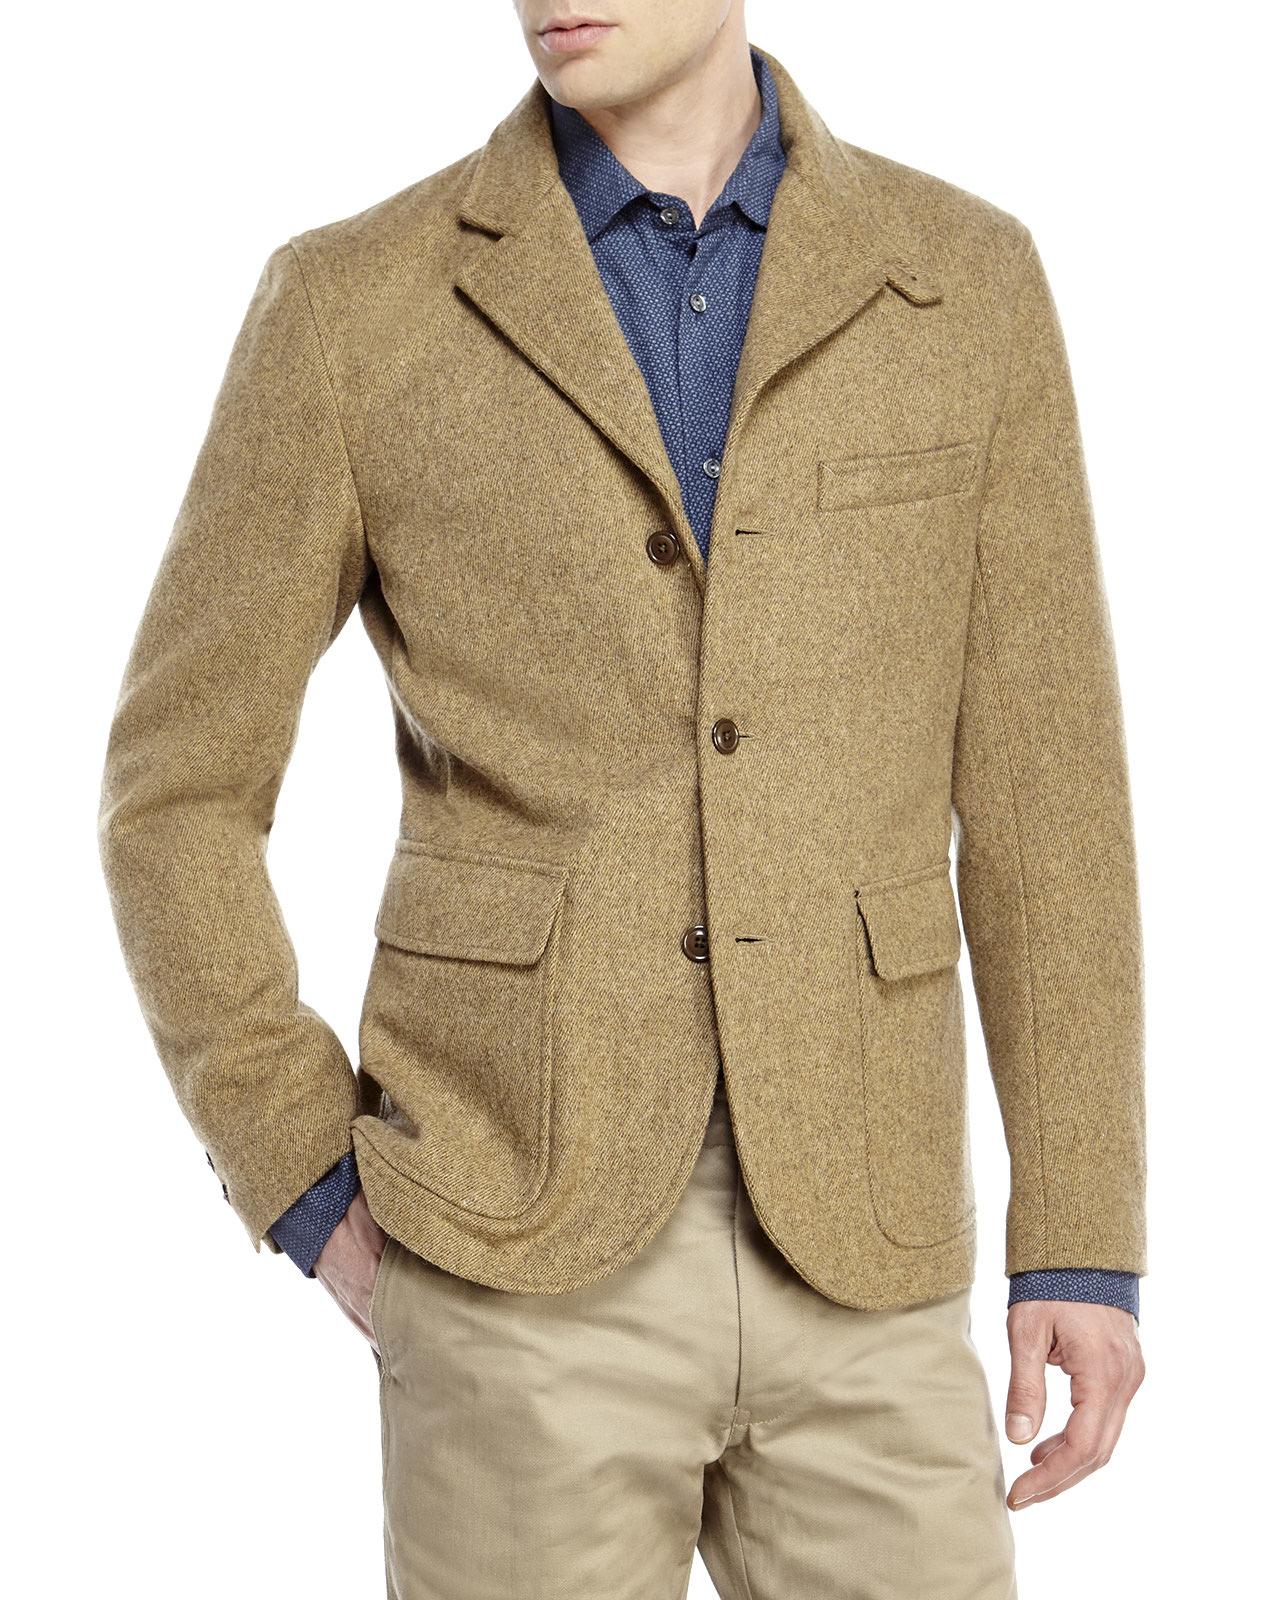 Woolrich Brown Jacket